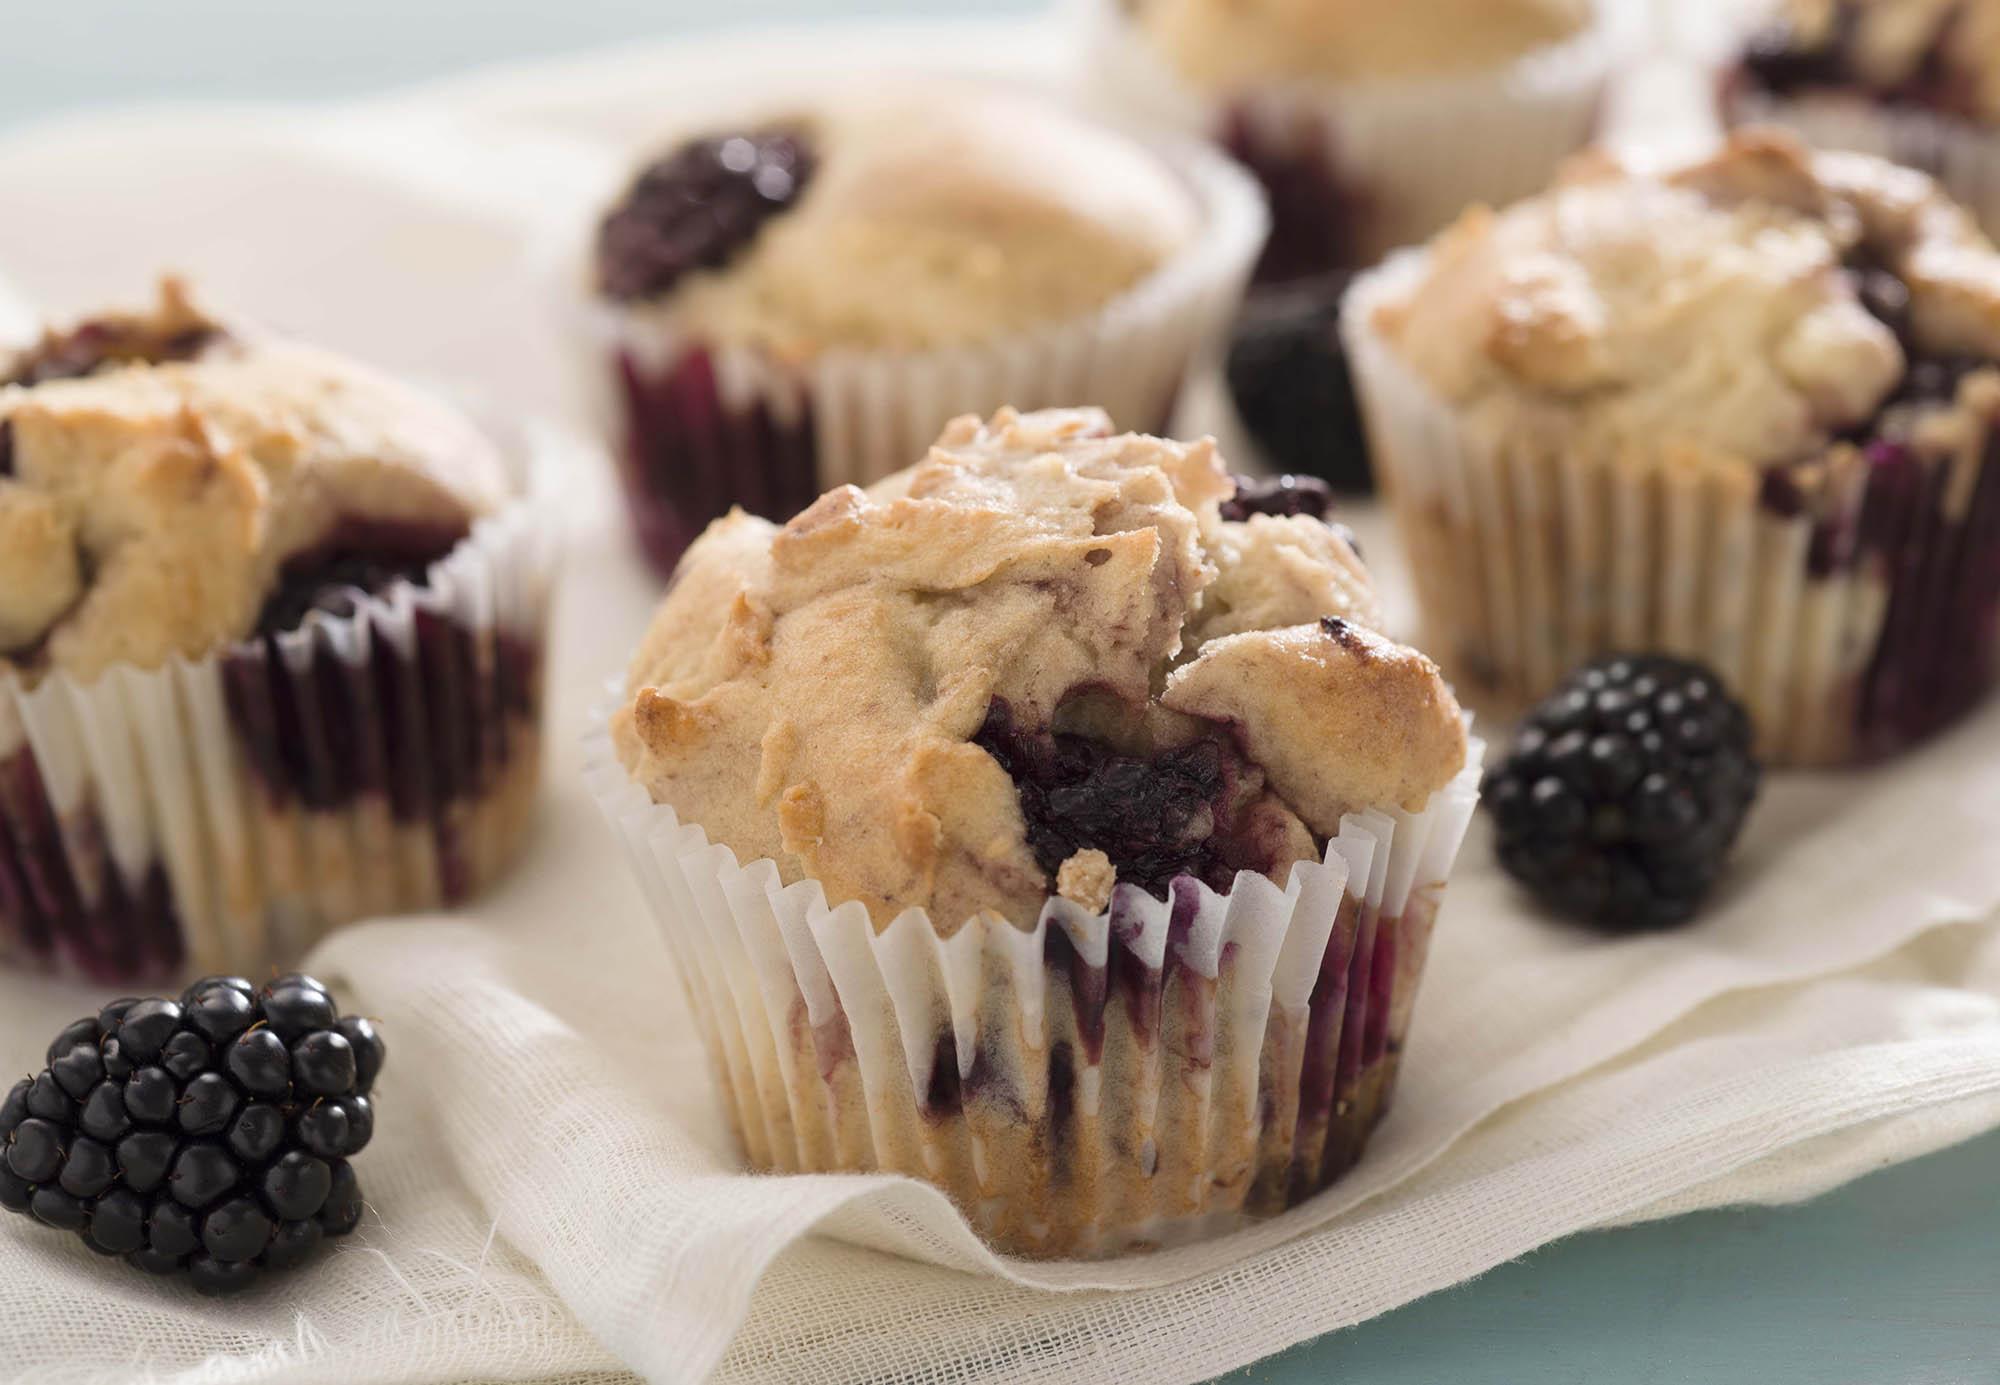 King Arthur Flour's Gluten-Free Blackberry Muffin